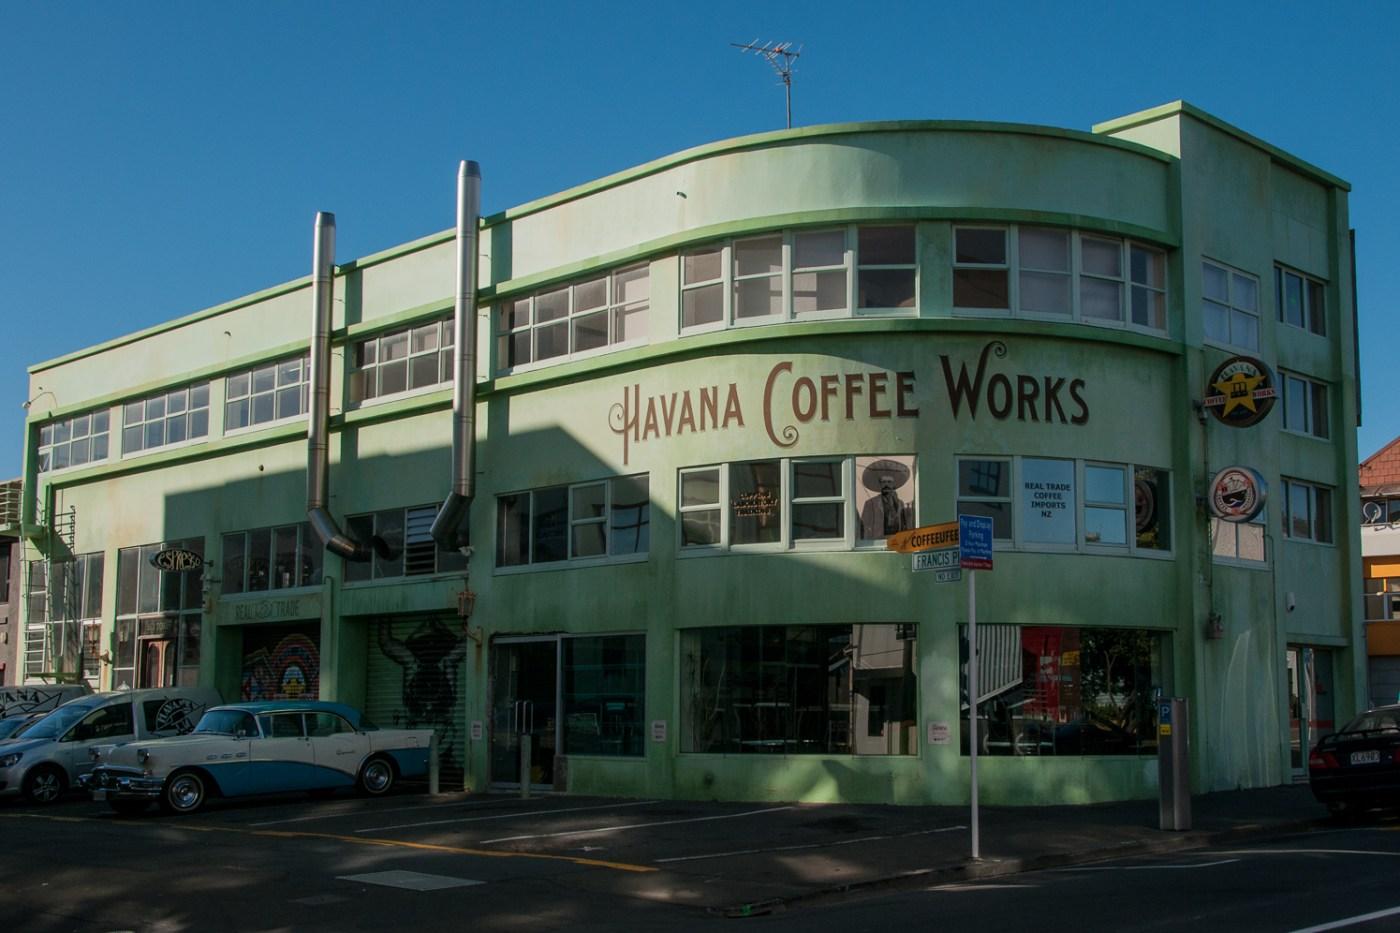 Havana Coffee Works